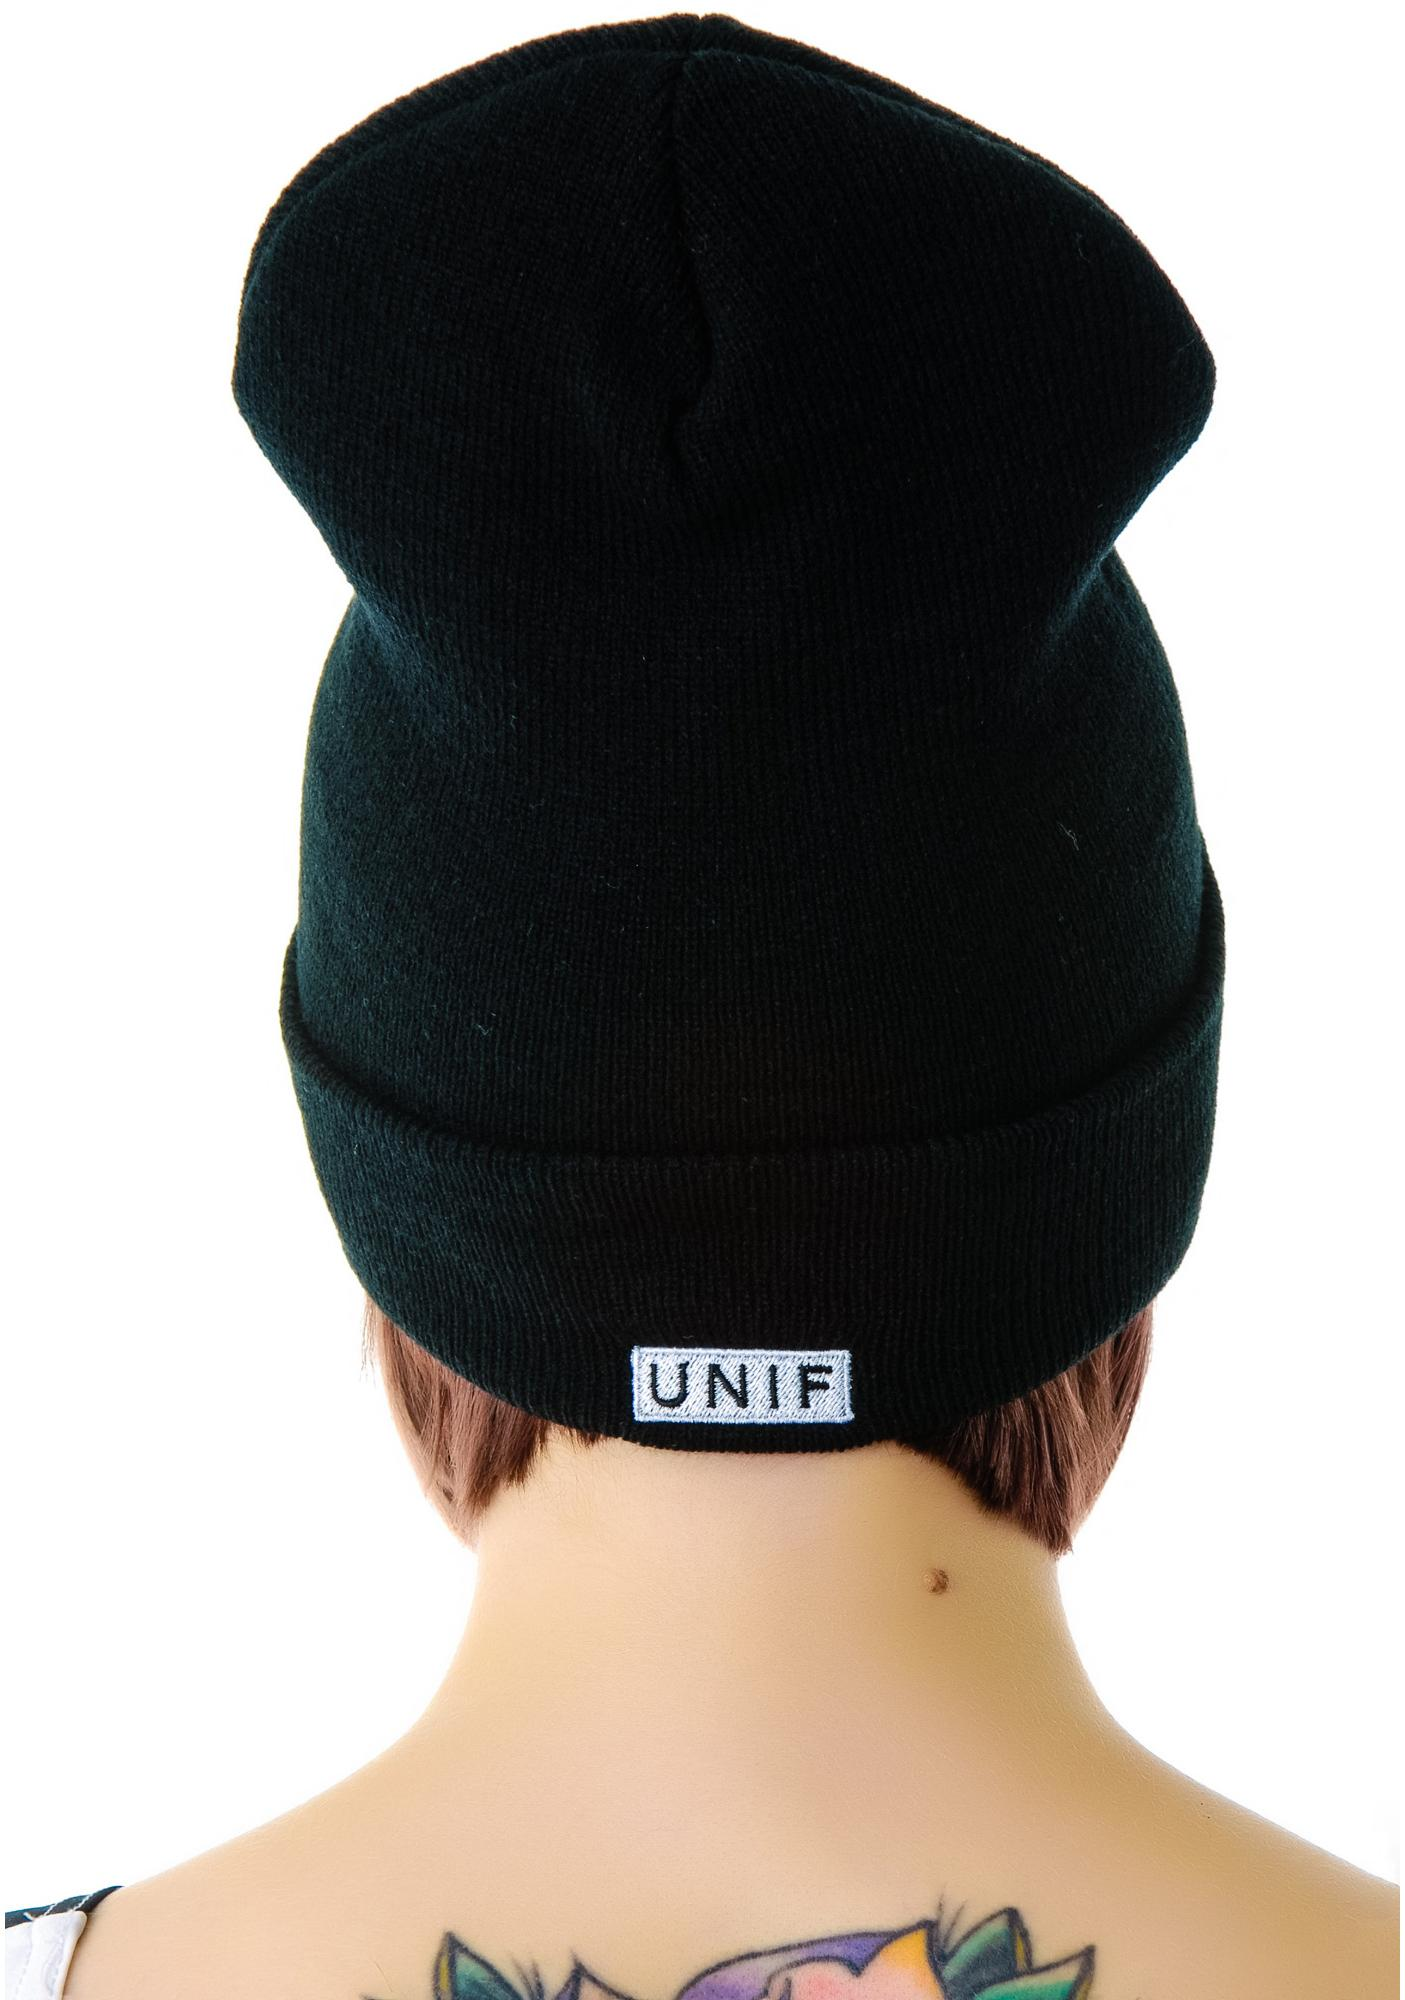 UNIF .COM Beanie